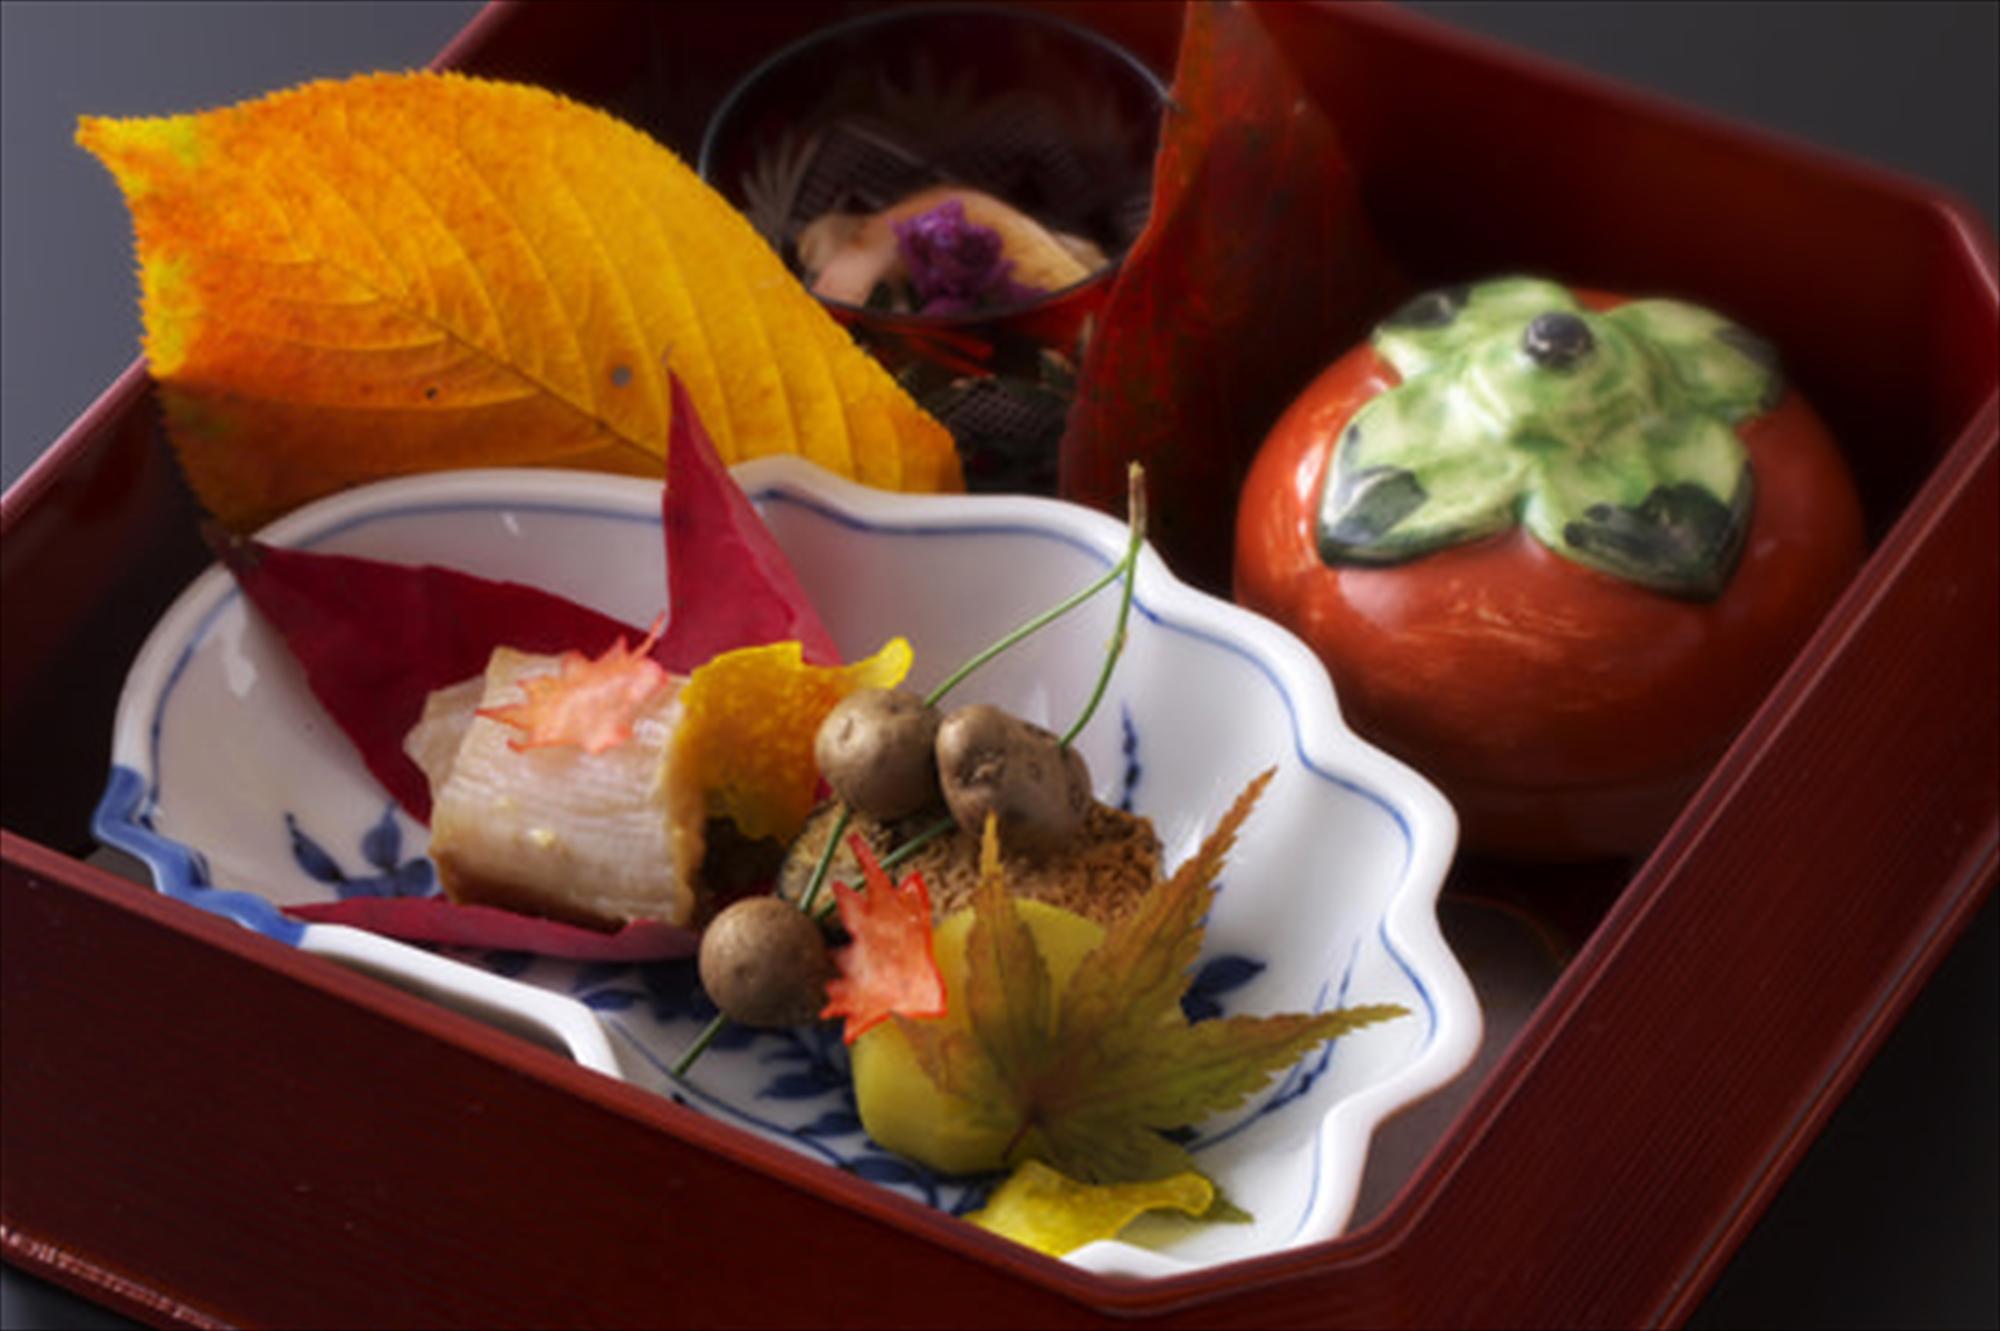 Jikishinbo Saiki cuisine